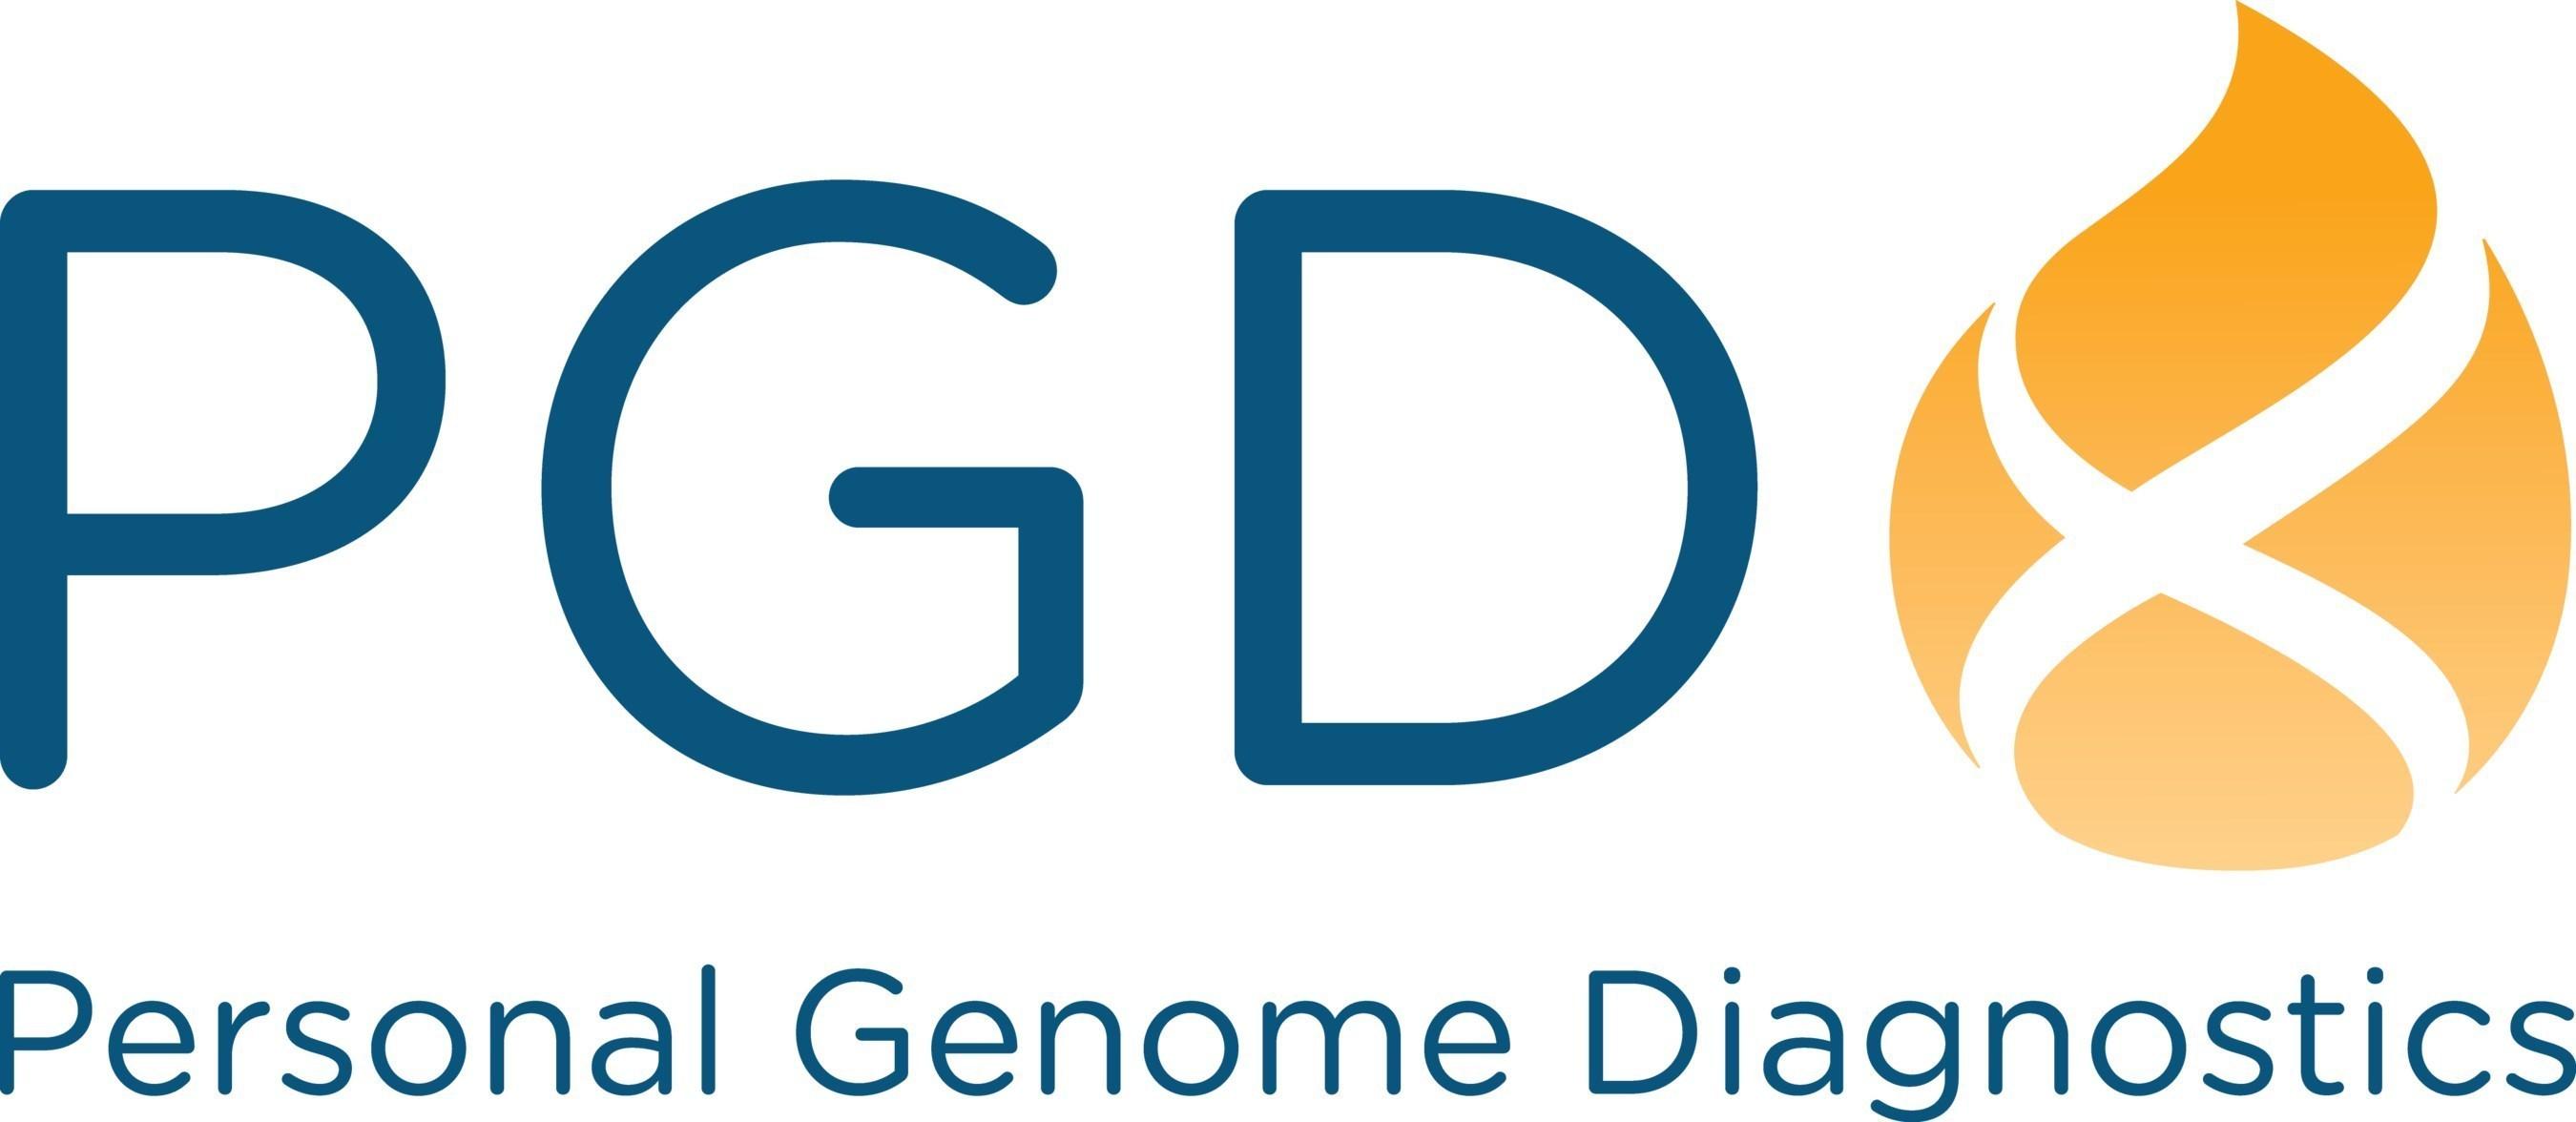 Personal Genome Diagnostics, Inc.